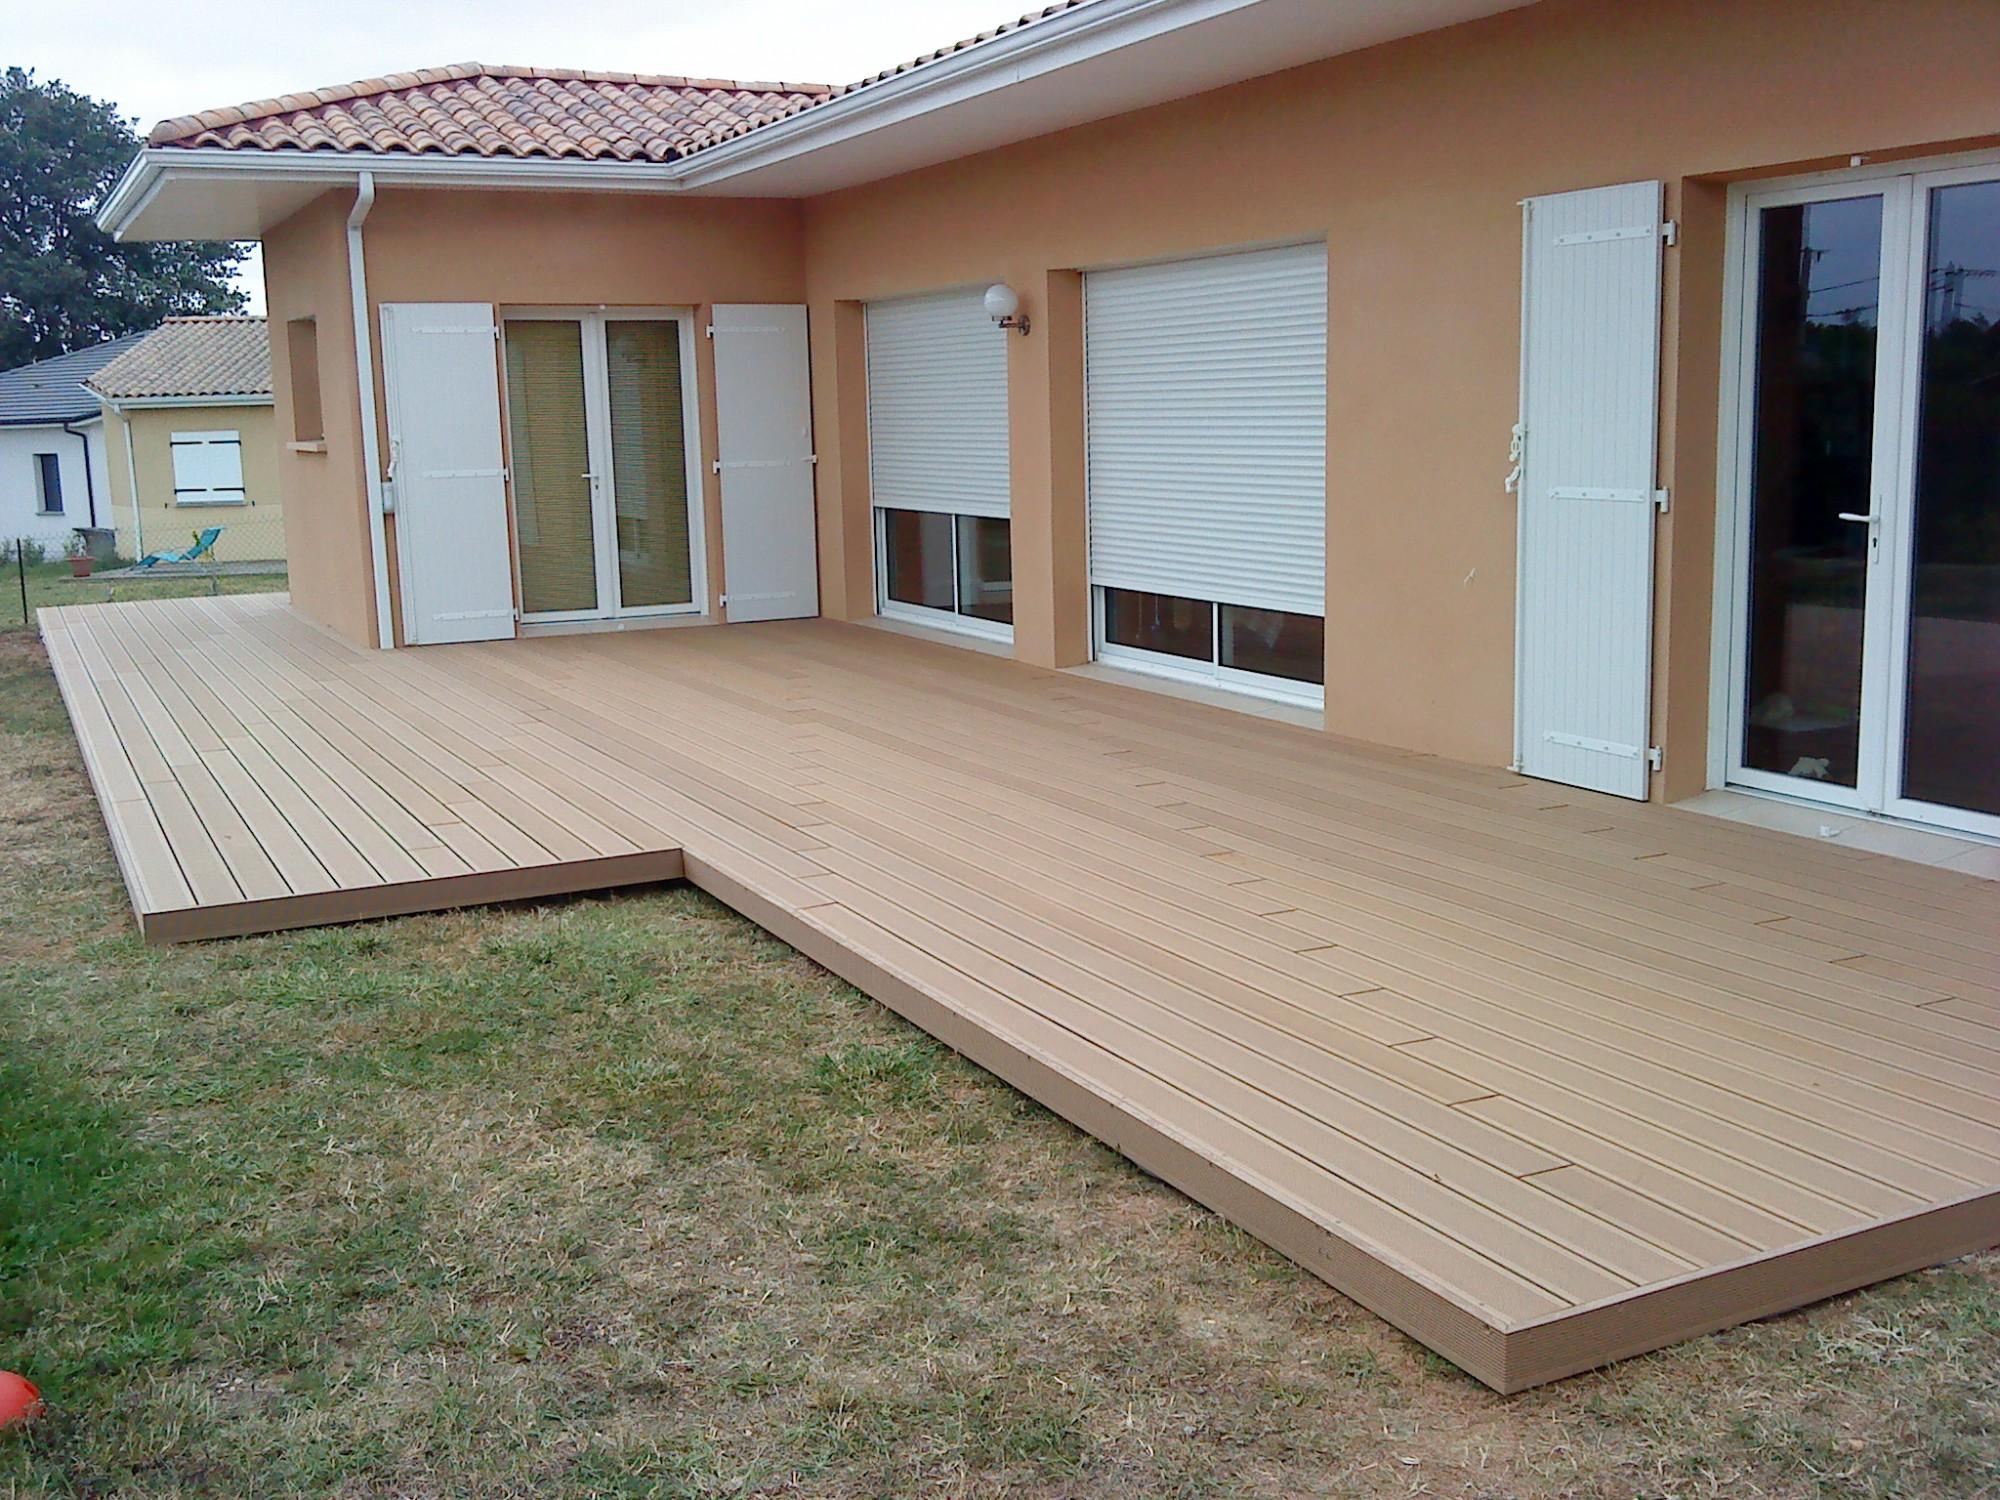 Terrasse bois composite installation jardin - Terrasse en bois ou composite ...